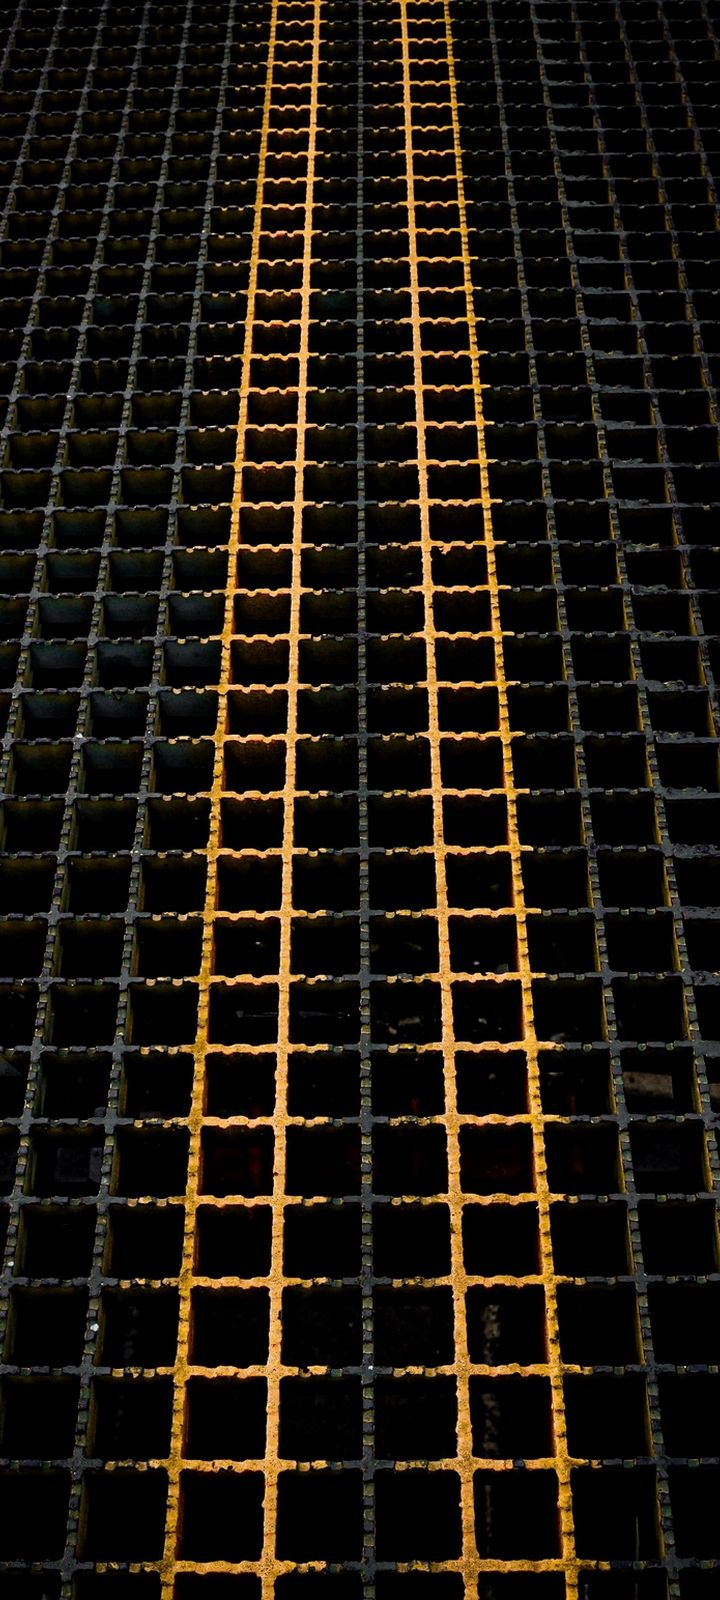 Grid Metallic Structure Wallpaper 720x1600